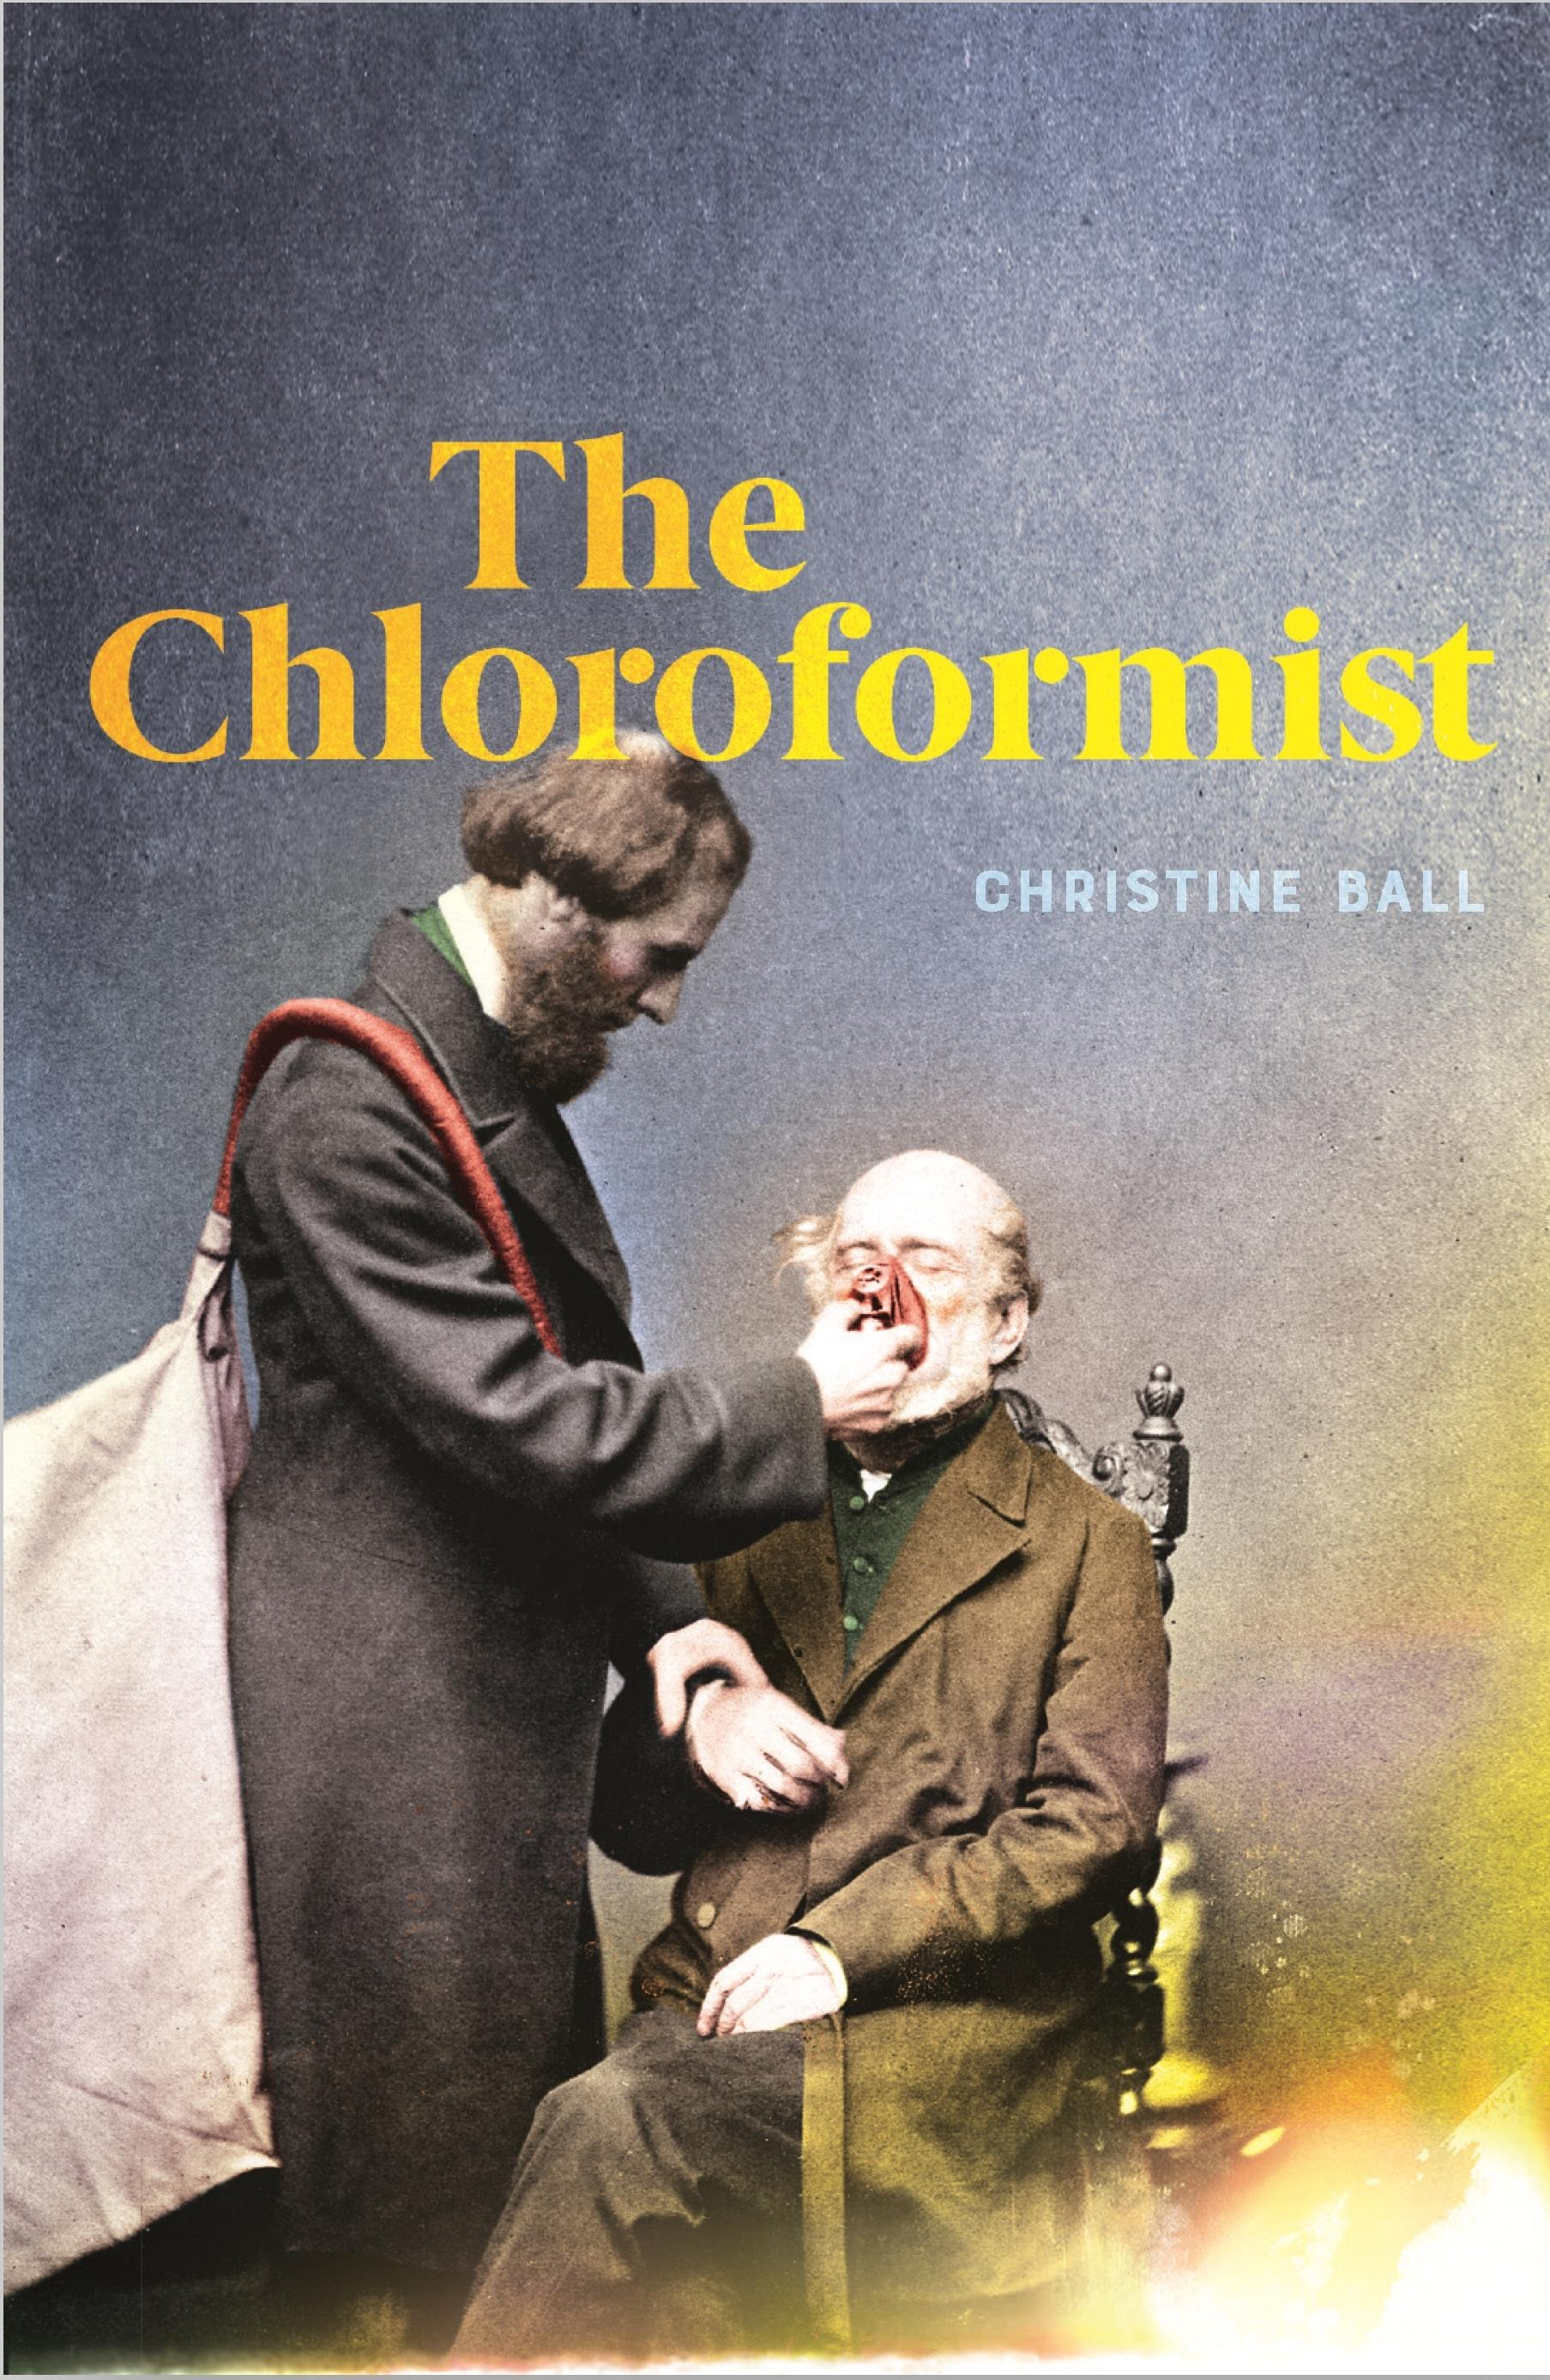 The Chloroformist